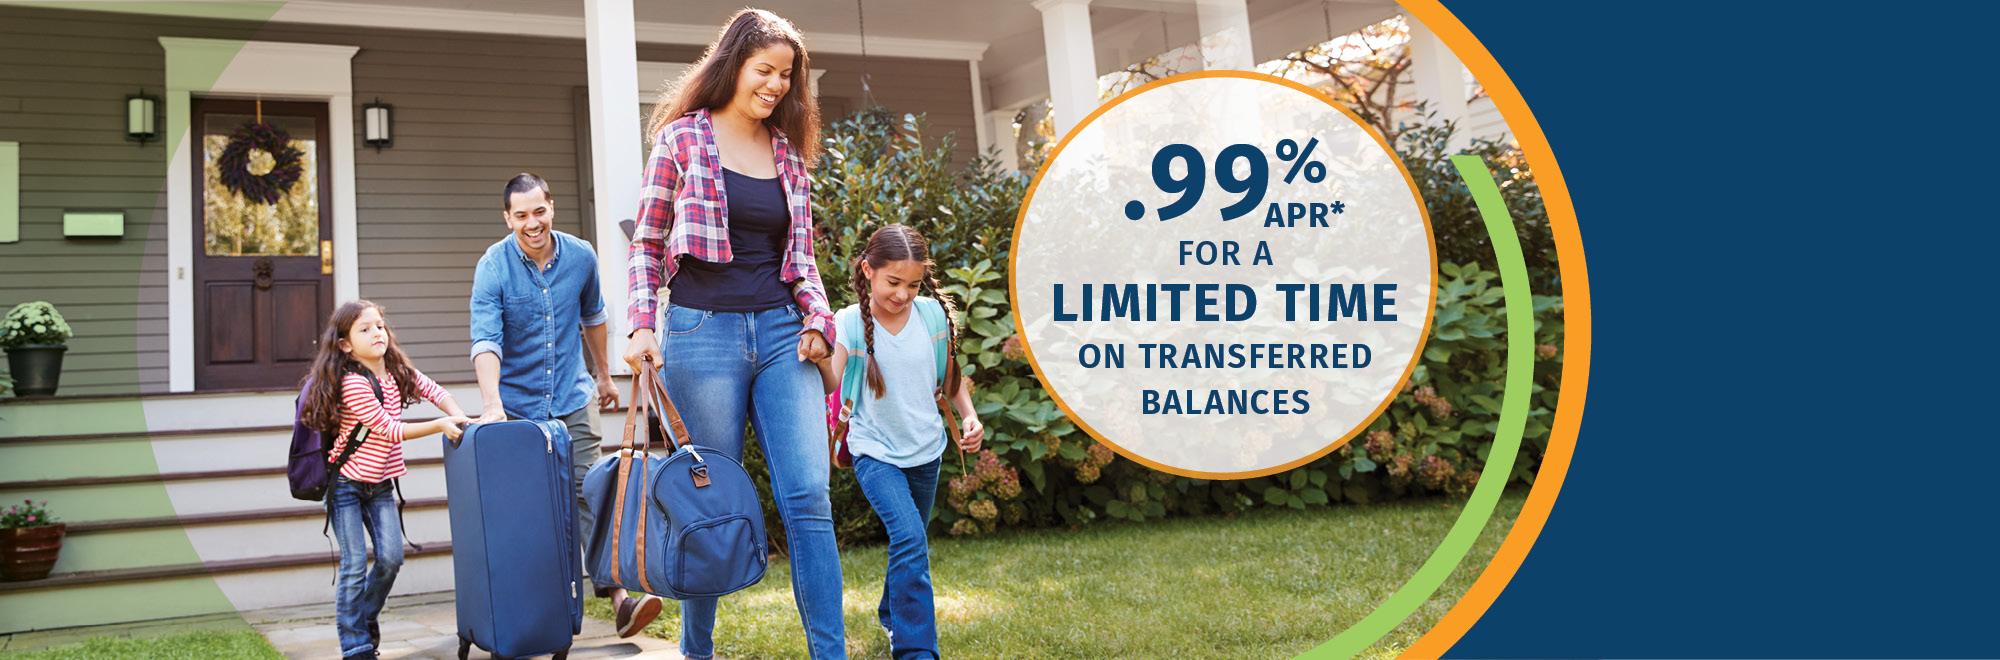 .99% APR* on credit card balance transfers